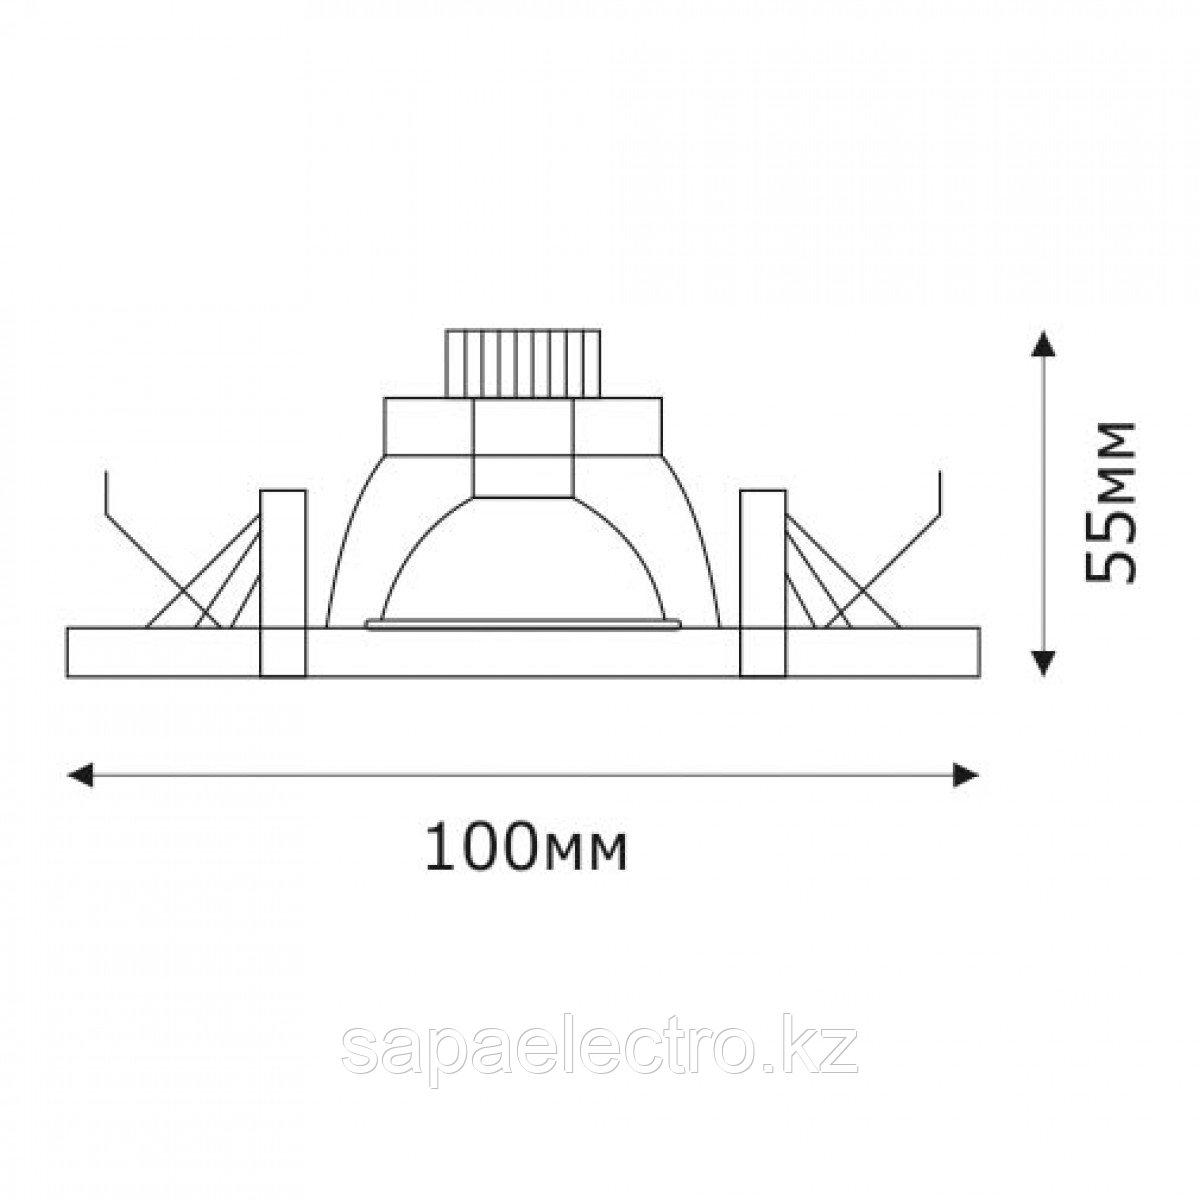 Спот LED SPD-DBWFDF ROUND 3W 5000K (TS) 60шт